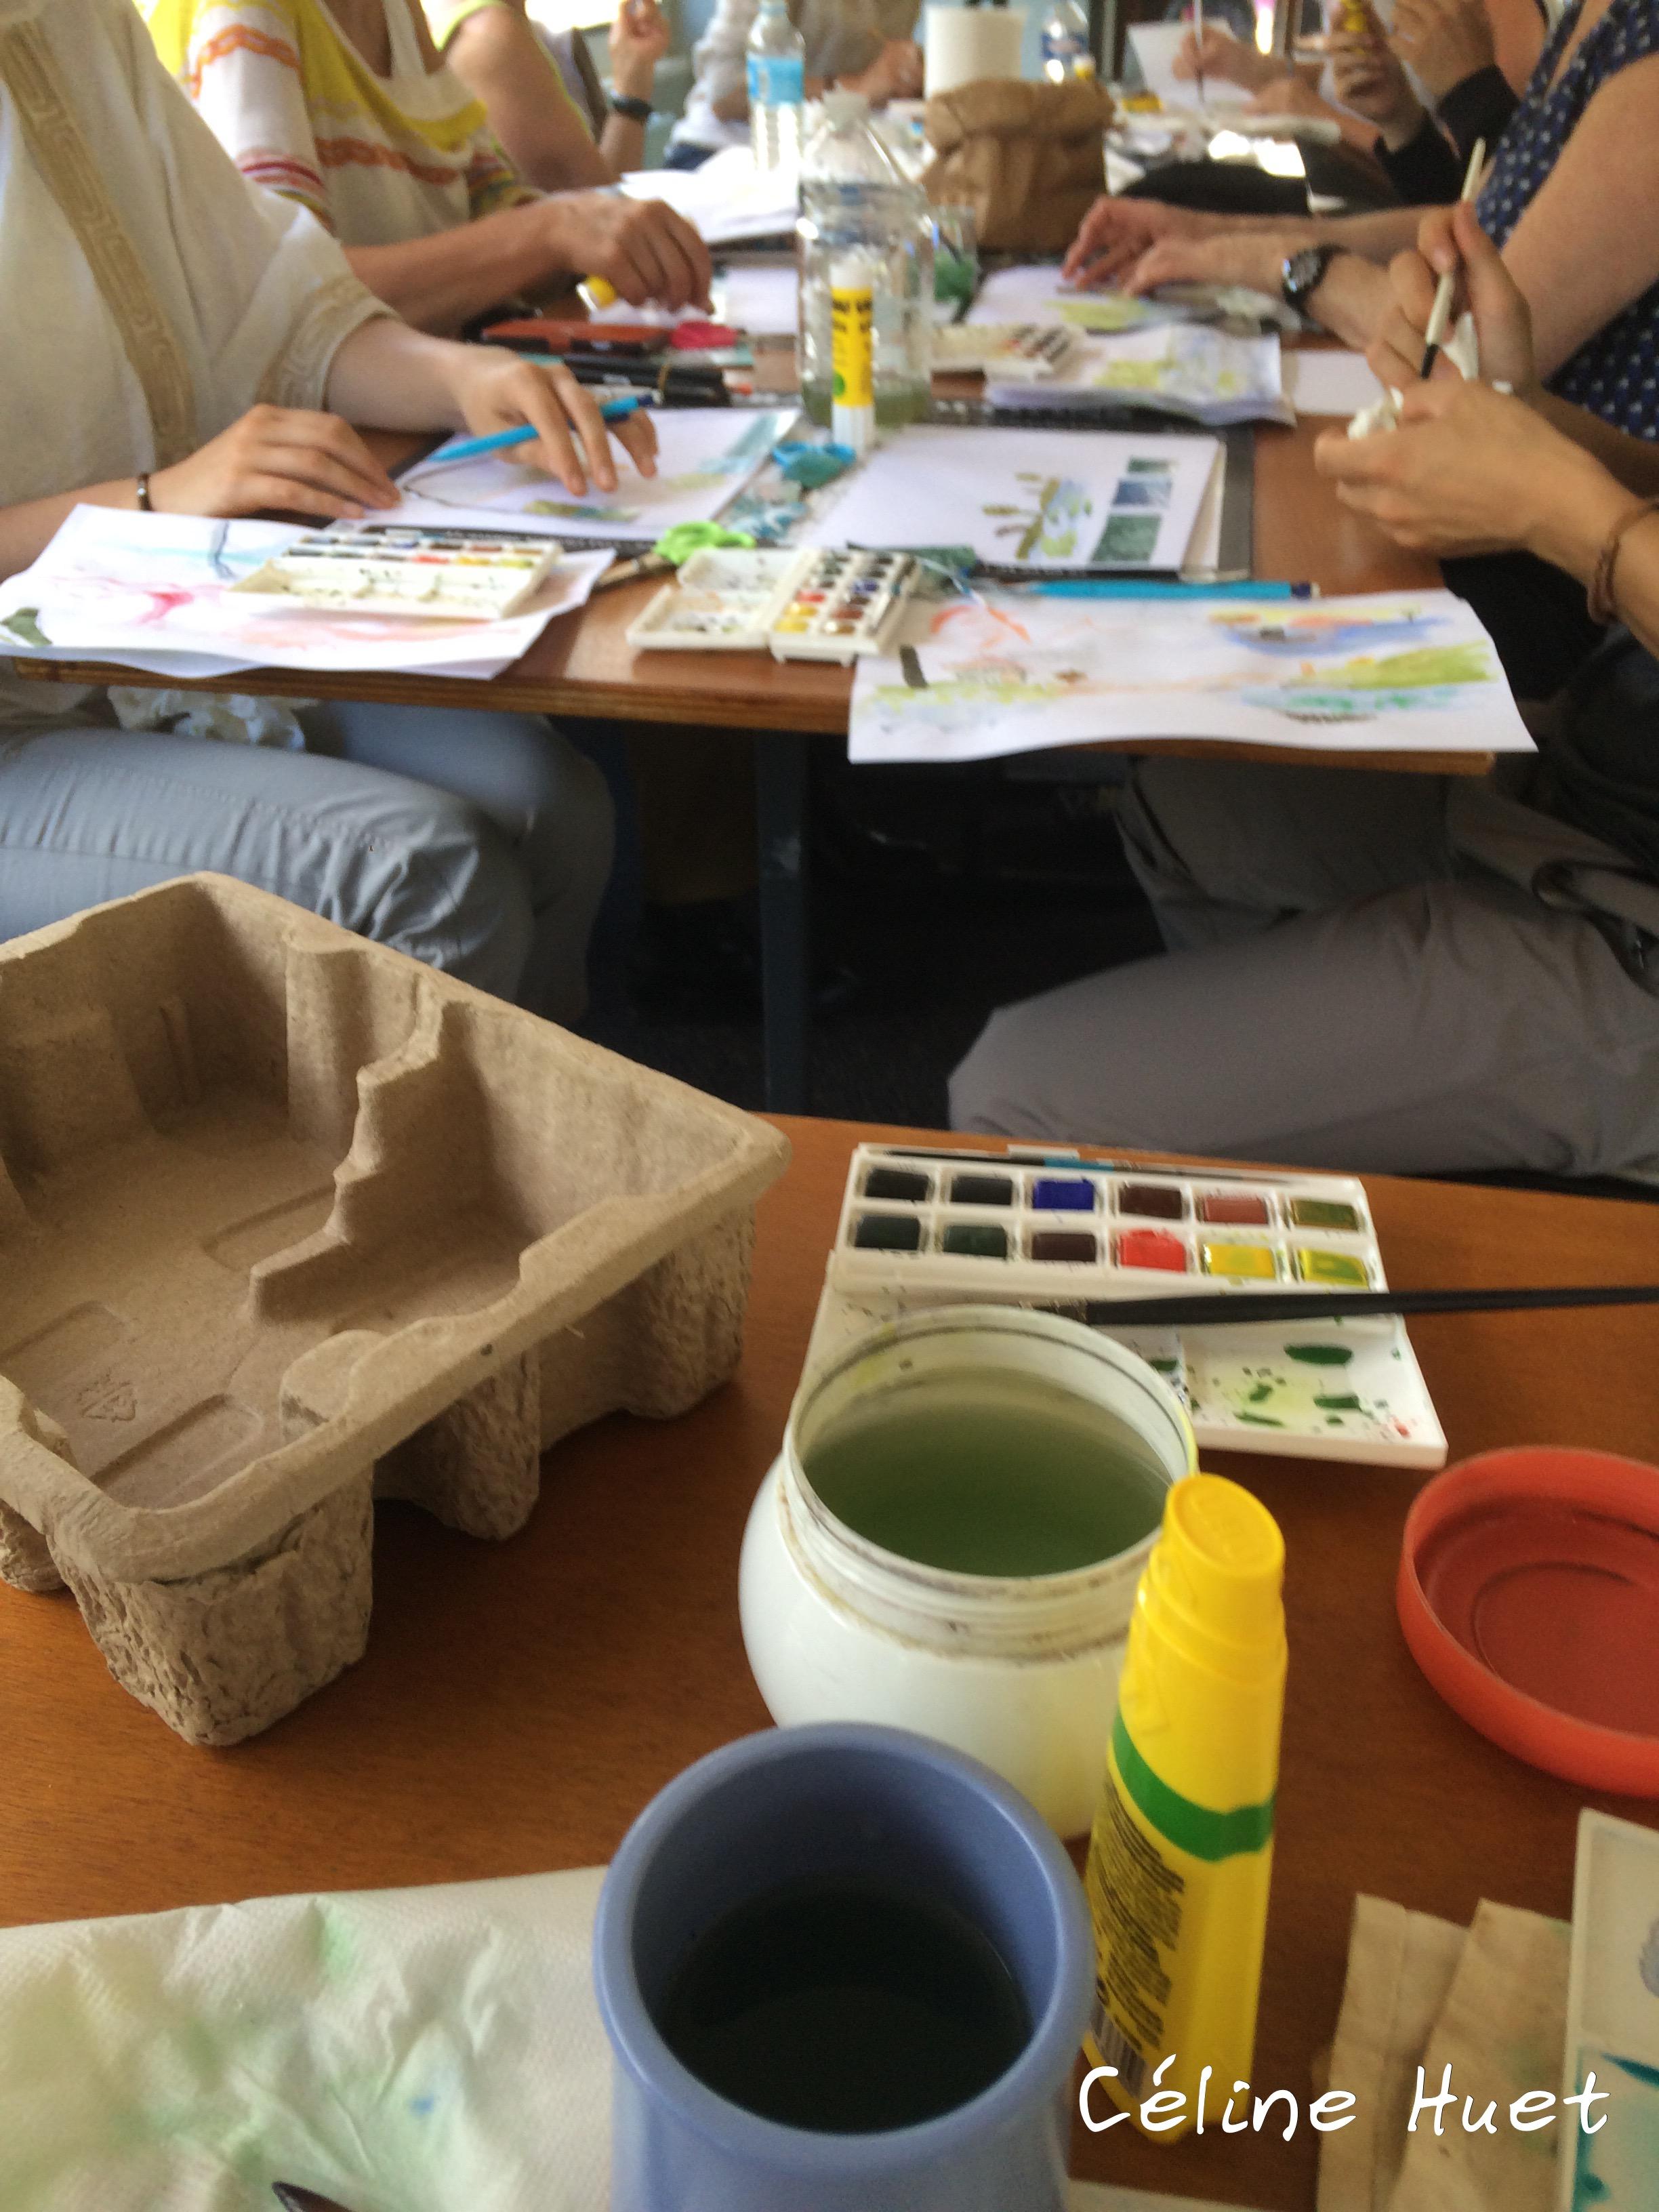 Atelier croisière Antonia Neyrins No Mad Festival Babel Voyages